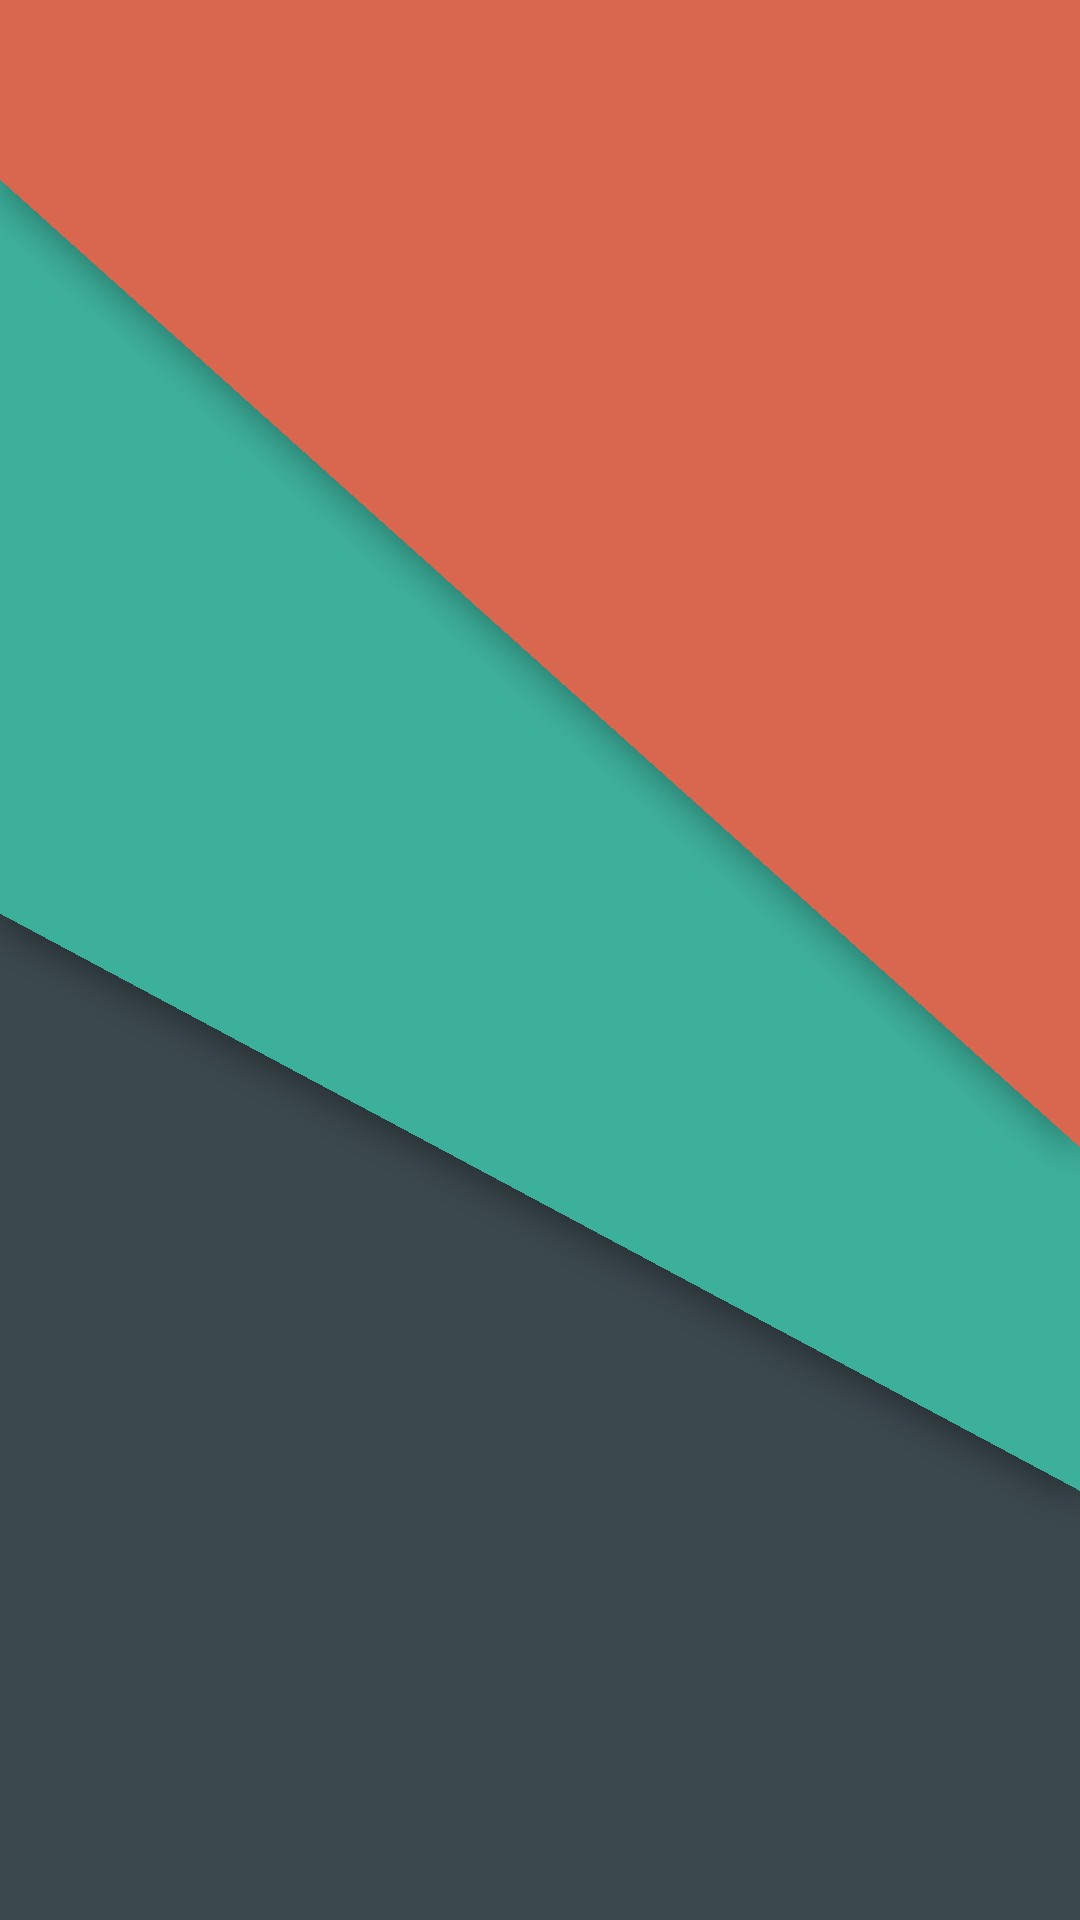 download superx wallpaper based on googles material design